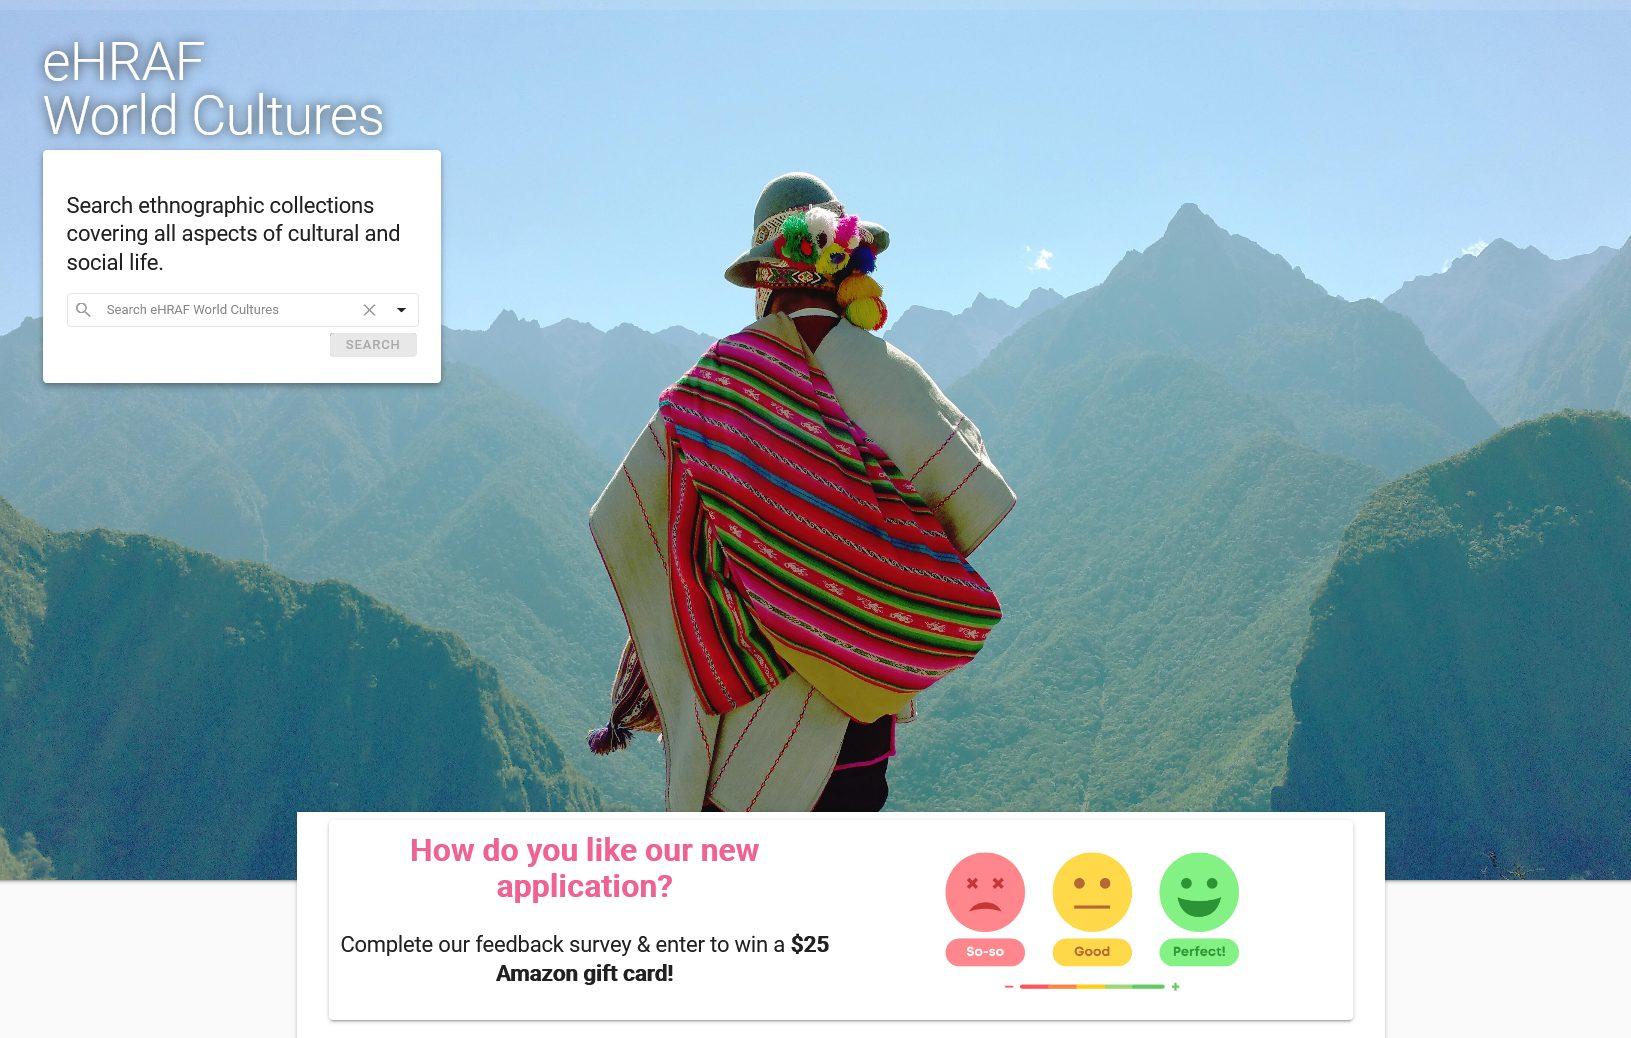 Screenshot showing banner link to survey